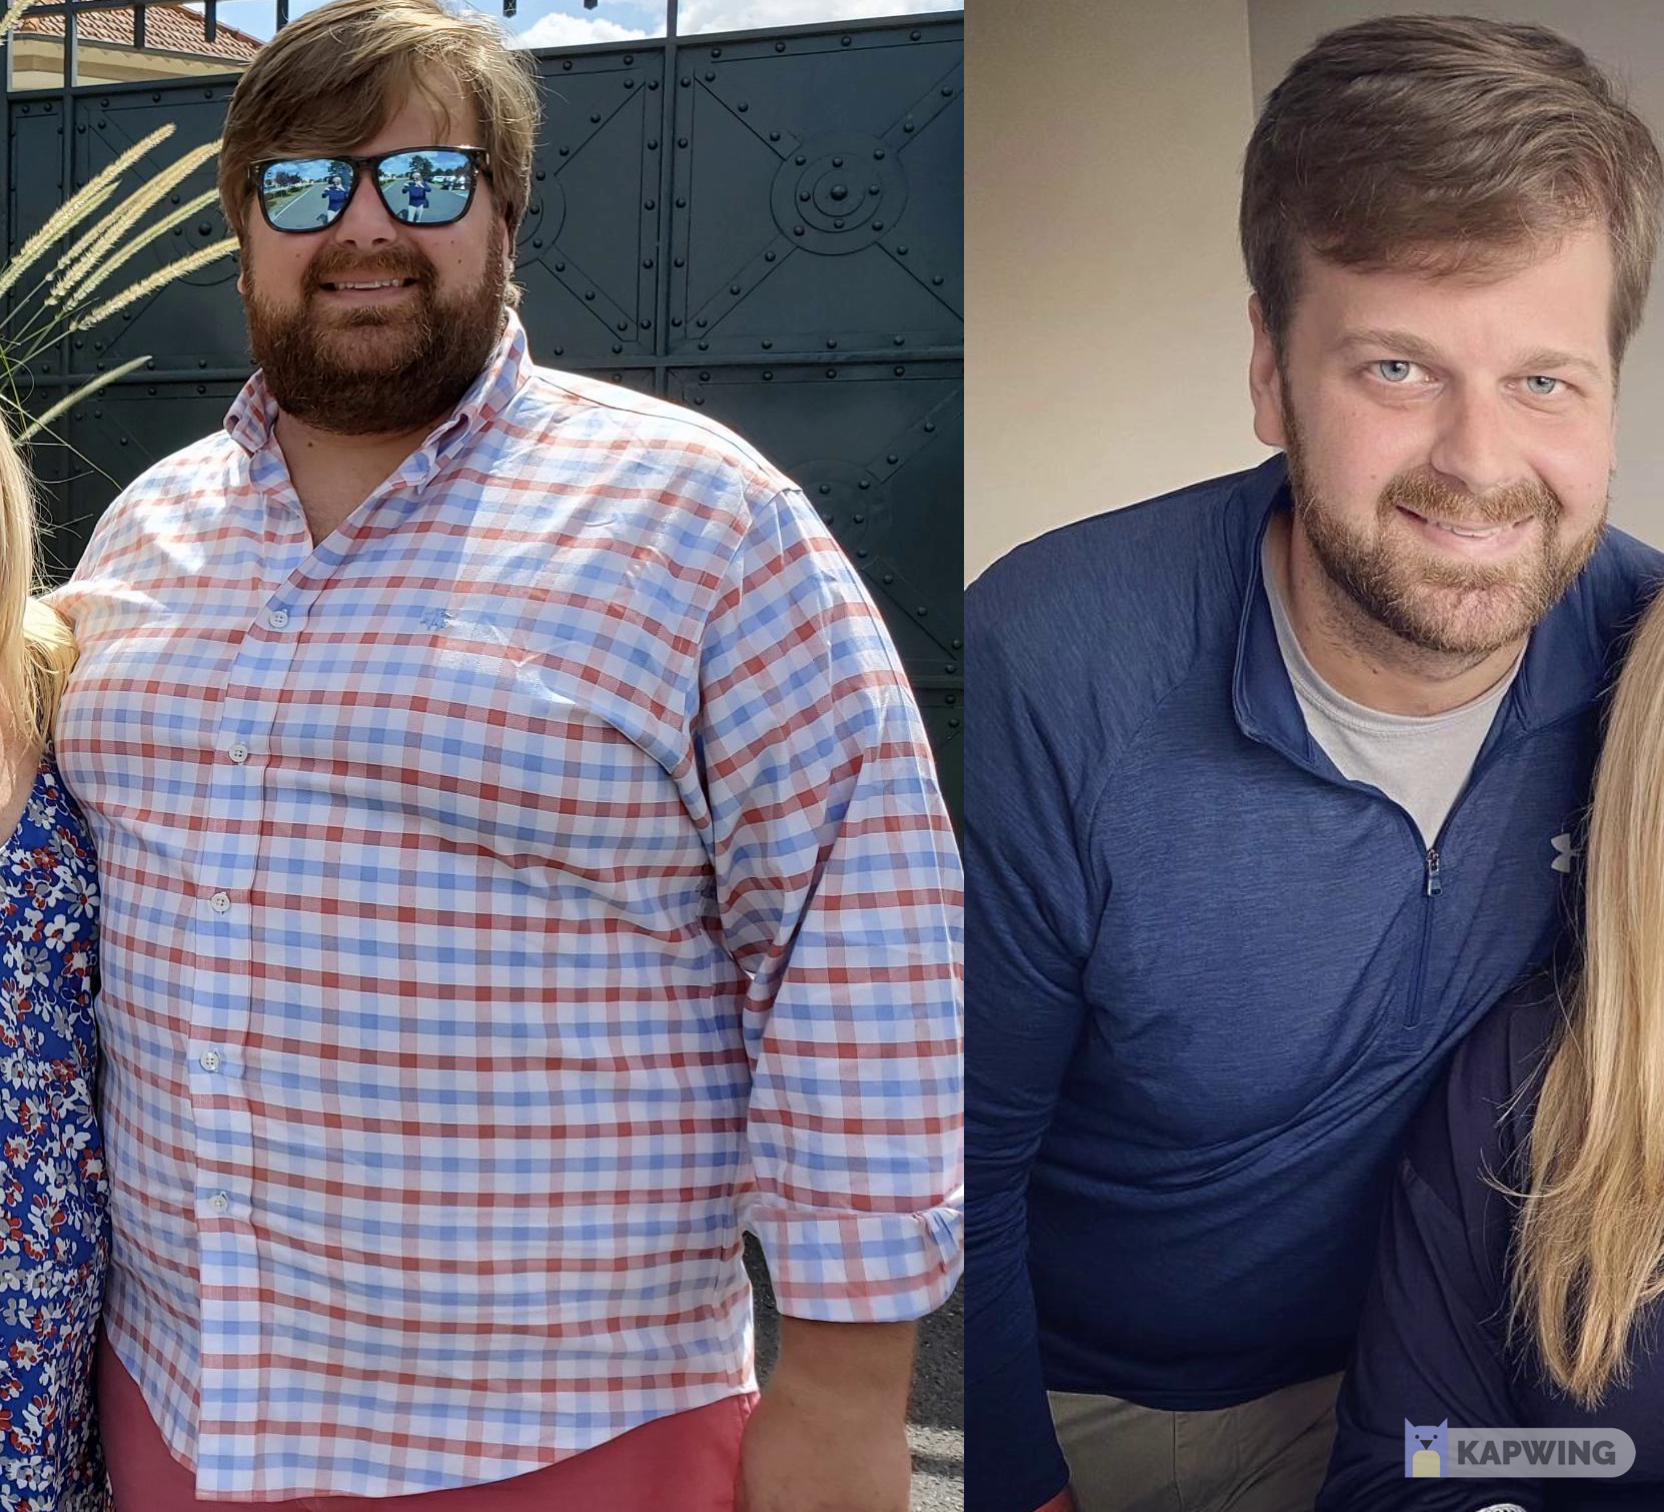 6 foot Male 102 lbs Weight Loss 336 lbs to 234 lbs